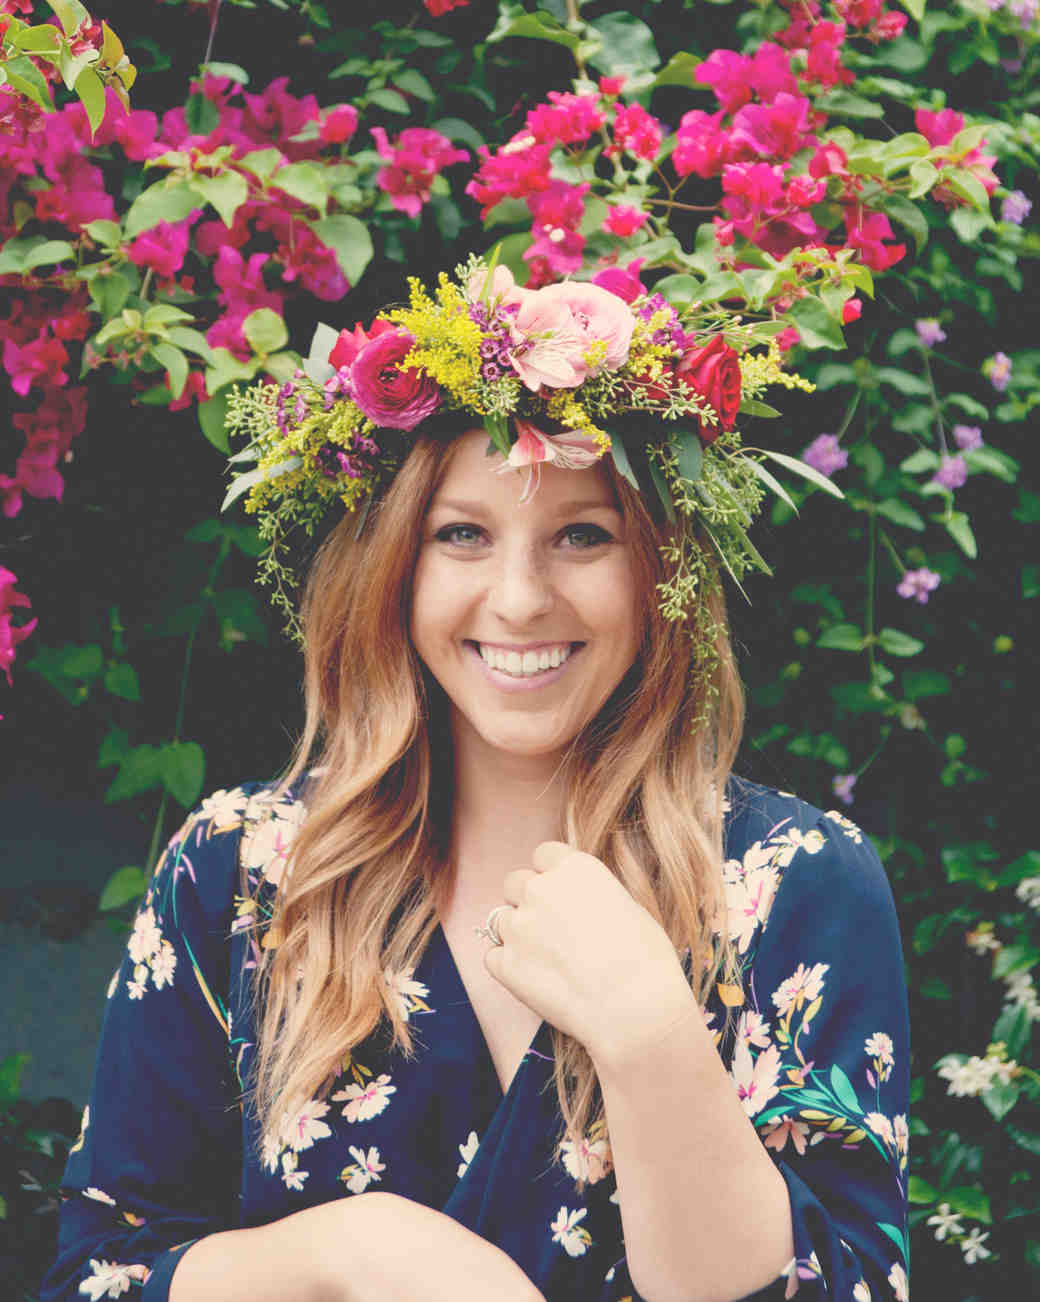 claire-thomas-bridal-shower-boho-flower-crown1-0814.jpg